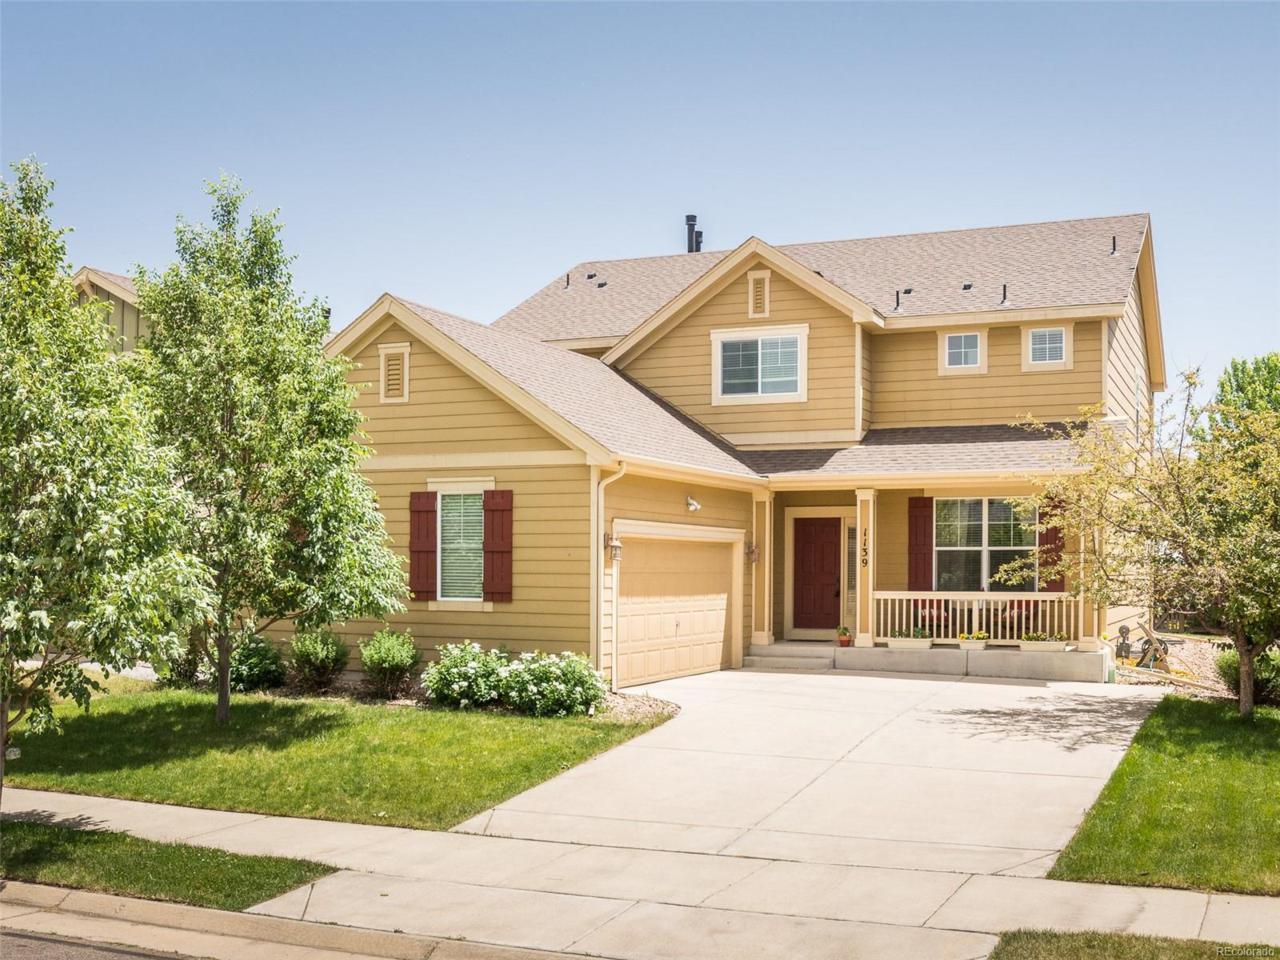 1139 Mircos Street, Erie, CO 80516 (MLS #8986677) :: 8z Real Estate